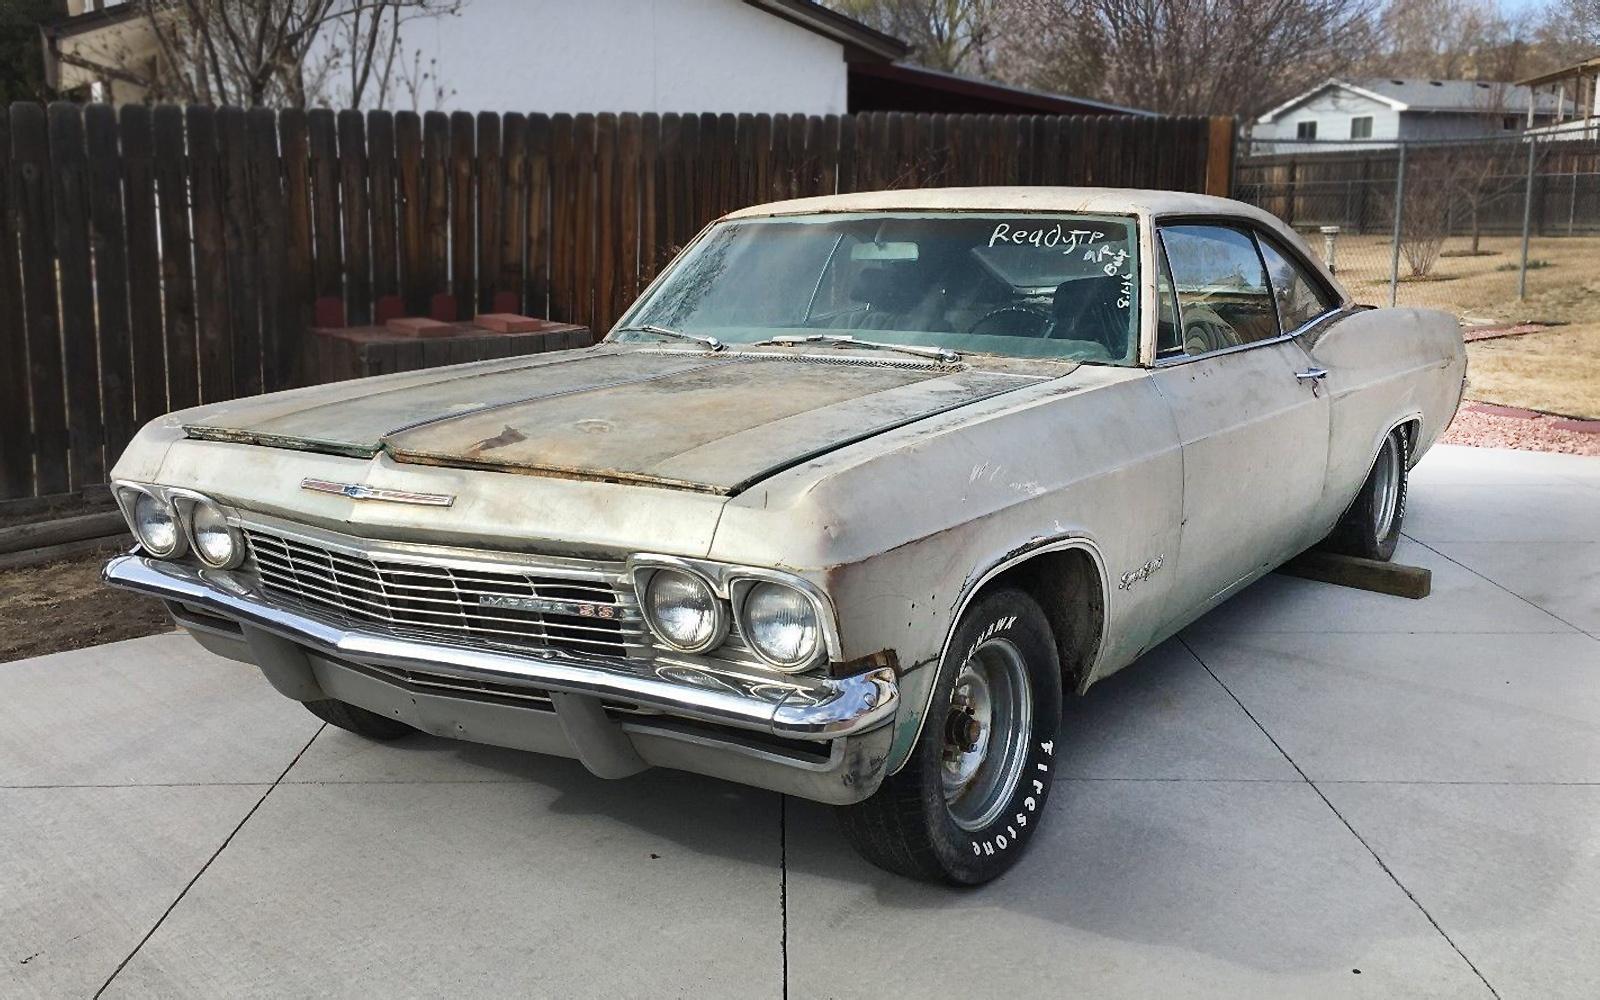 396 4 Speed 1965 Chevrolet Impala Ss